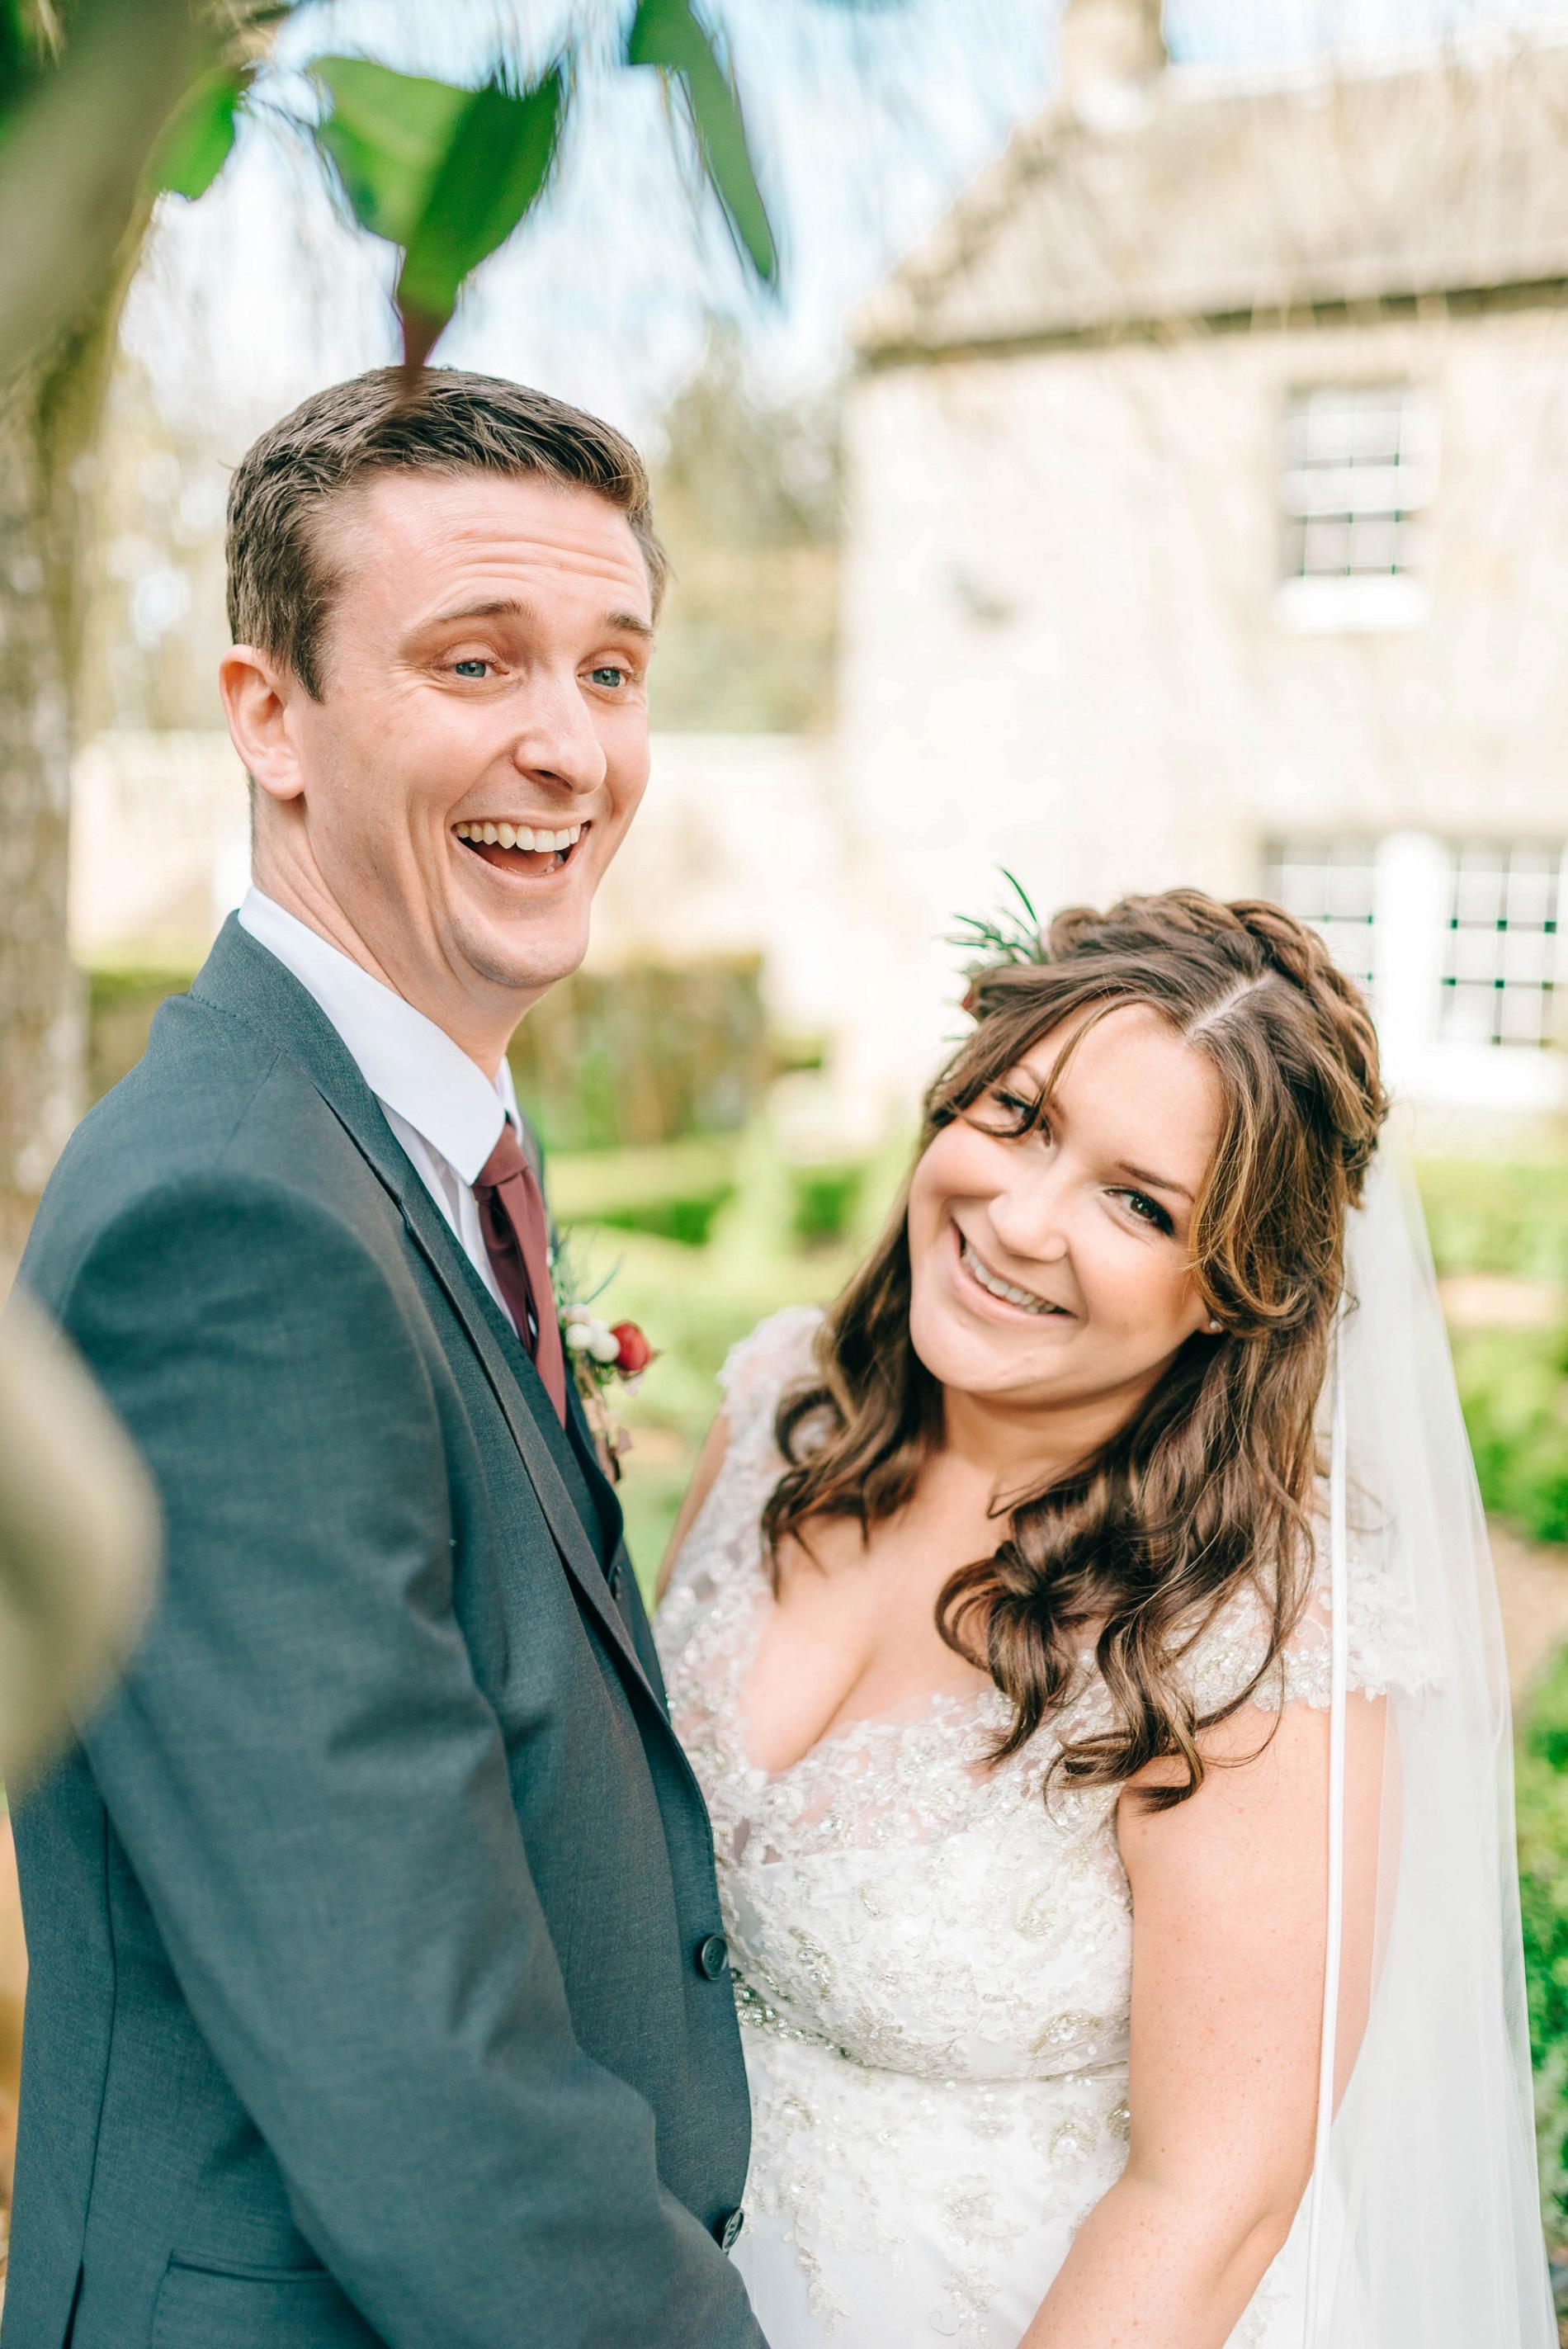 A Boho Wedding at Woodhill Hall (c) Matt Ethan (57)